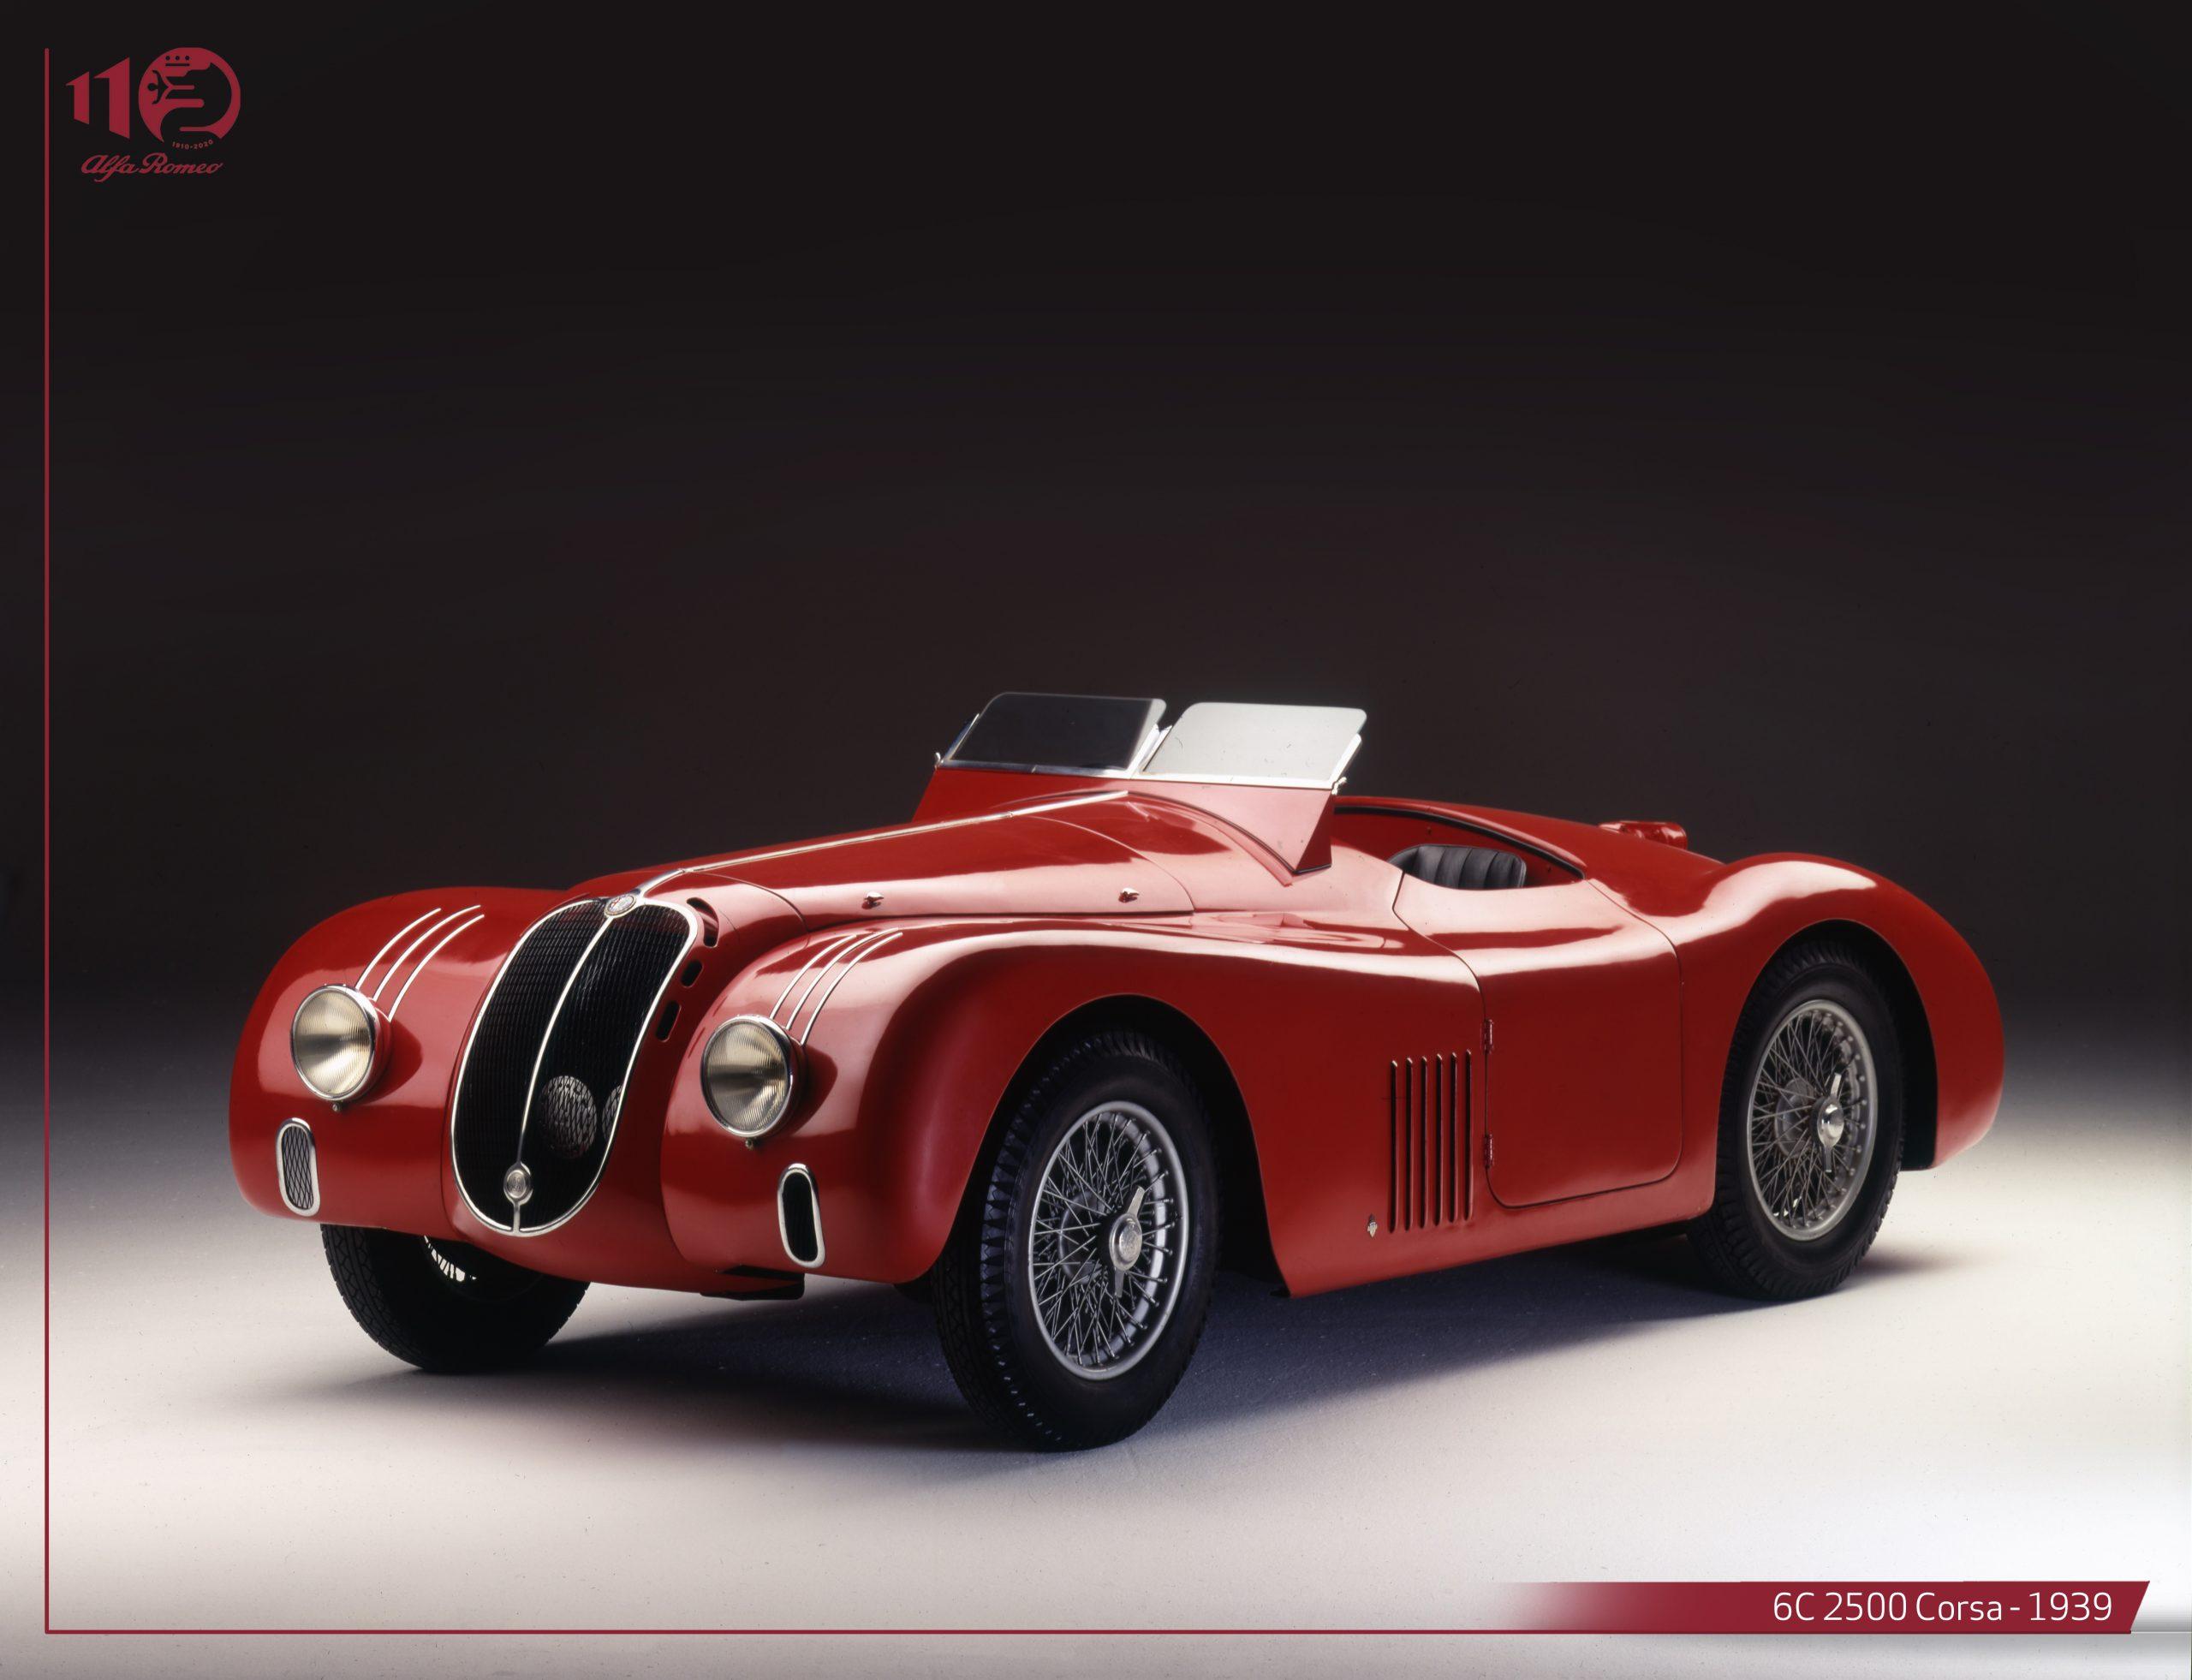 Alfa Romeo 6c 2500 corsa